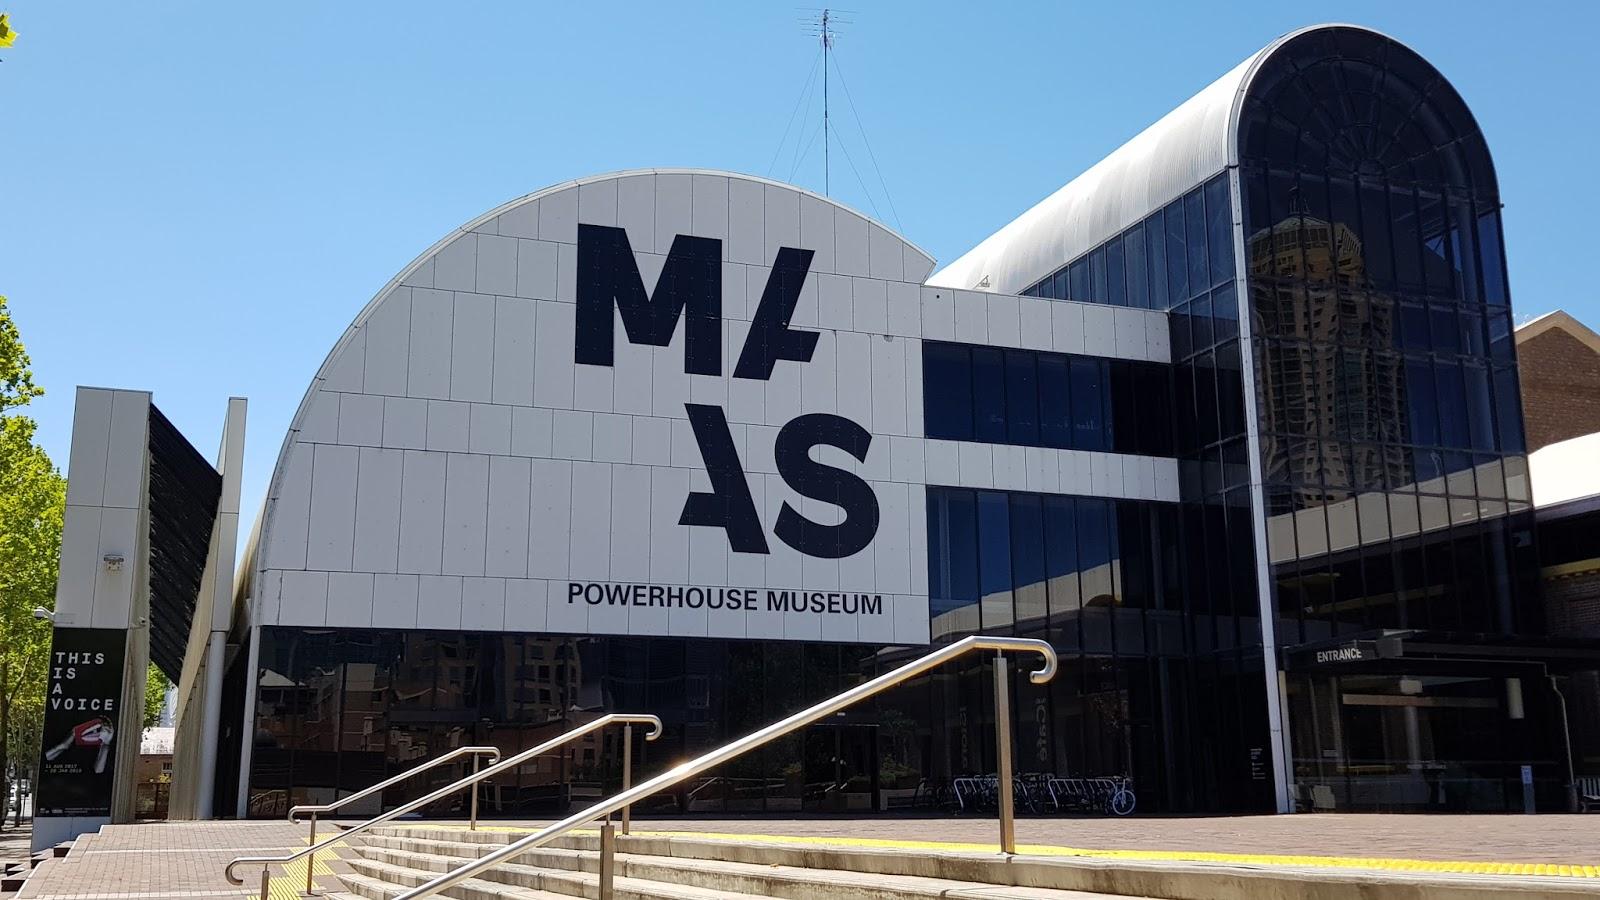 Sydney City And Suburbs Ultimo Powerhouse Museum